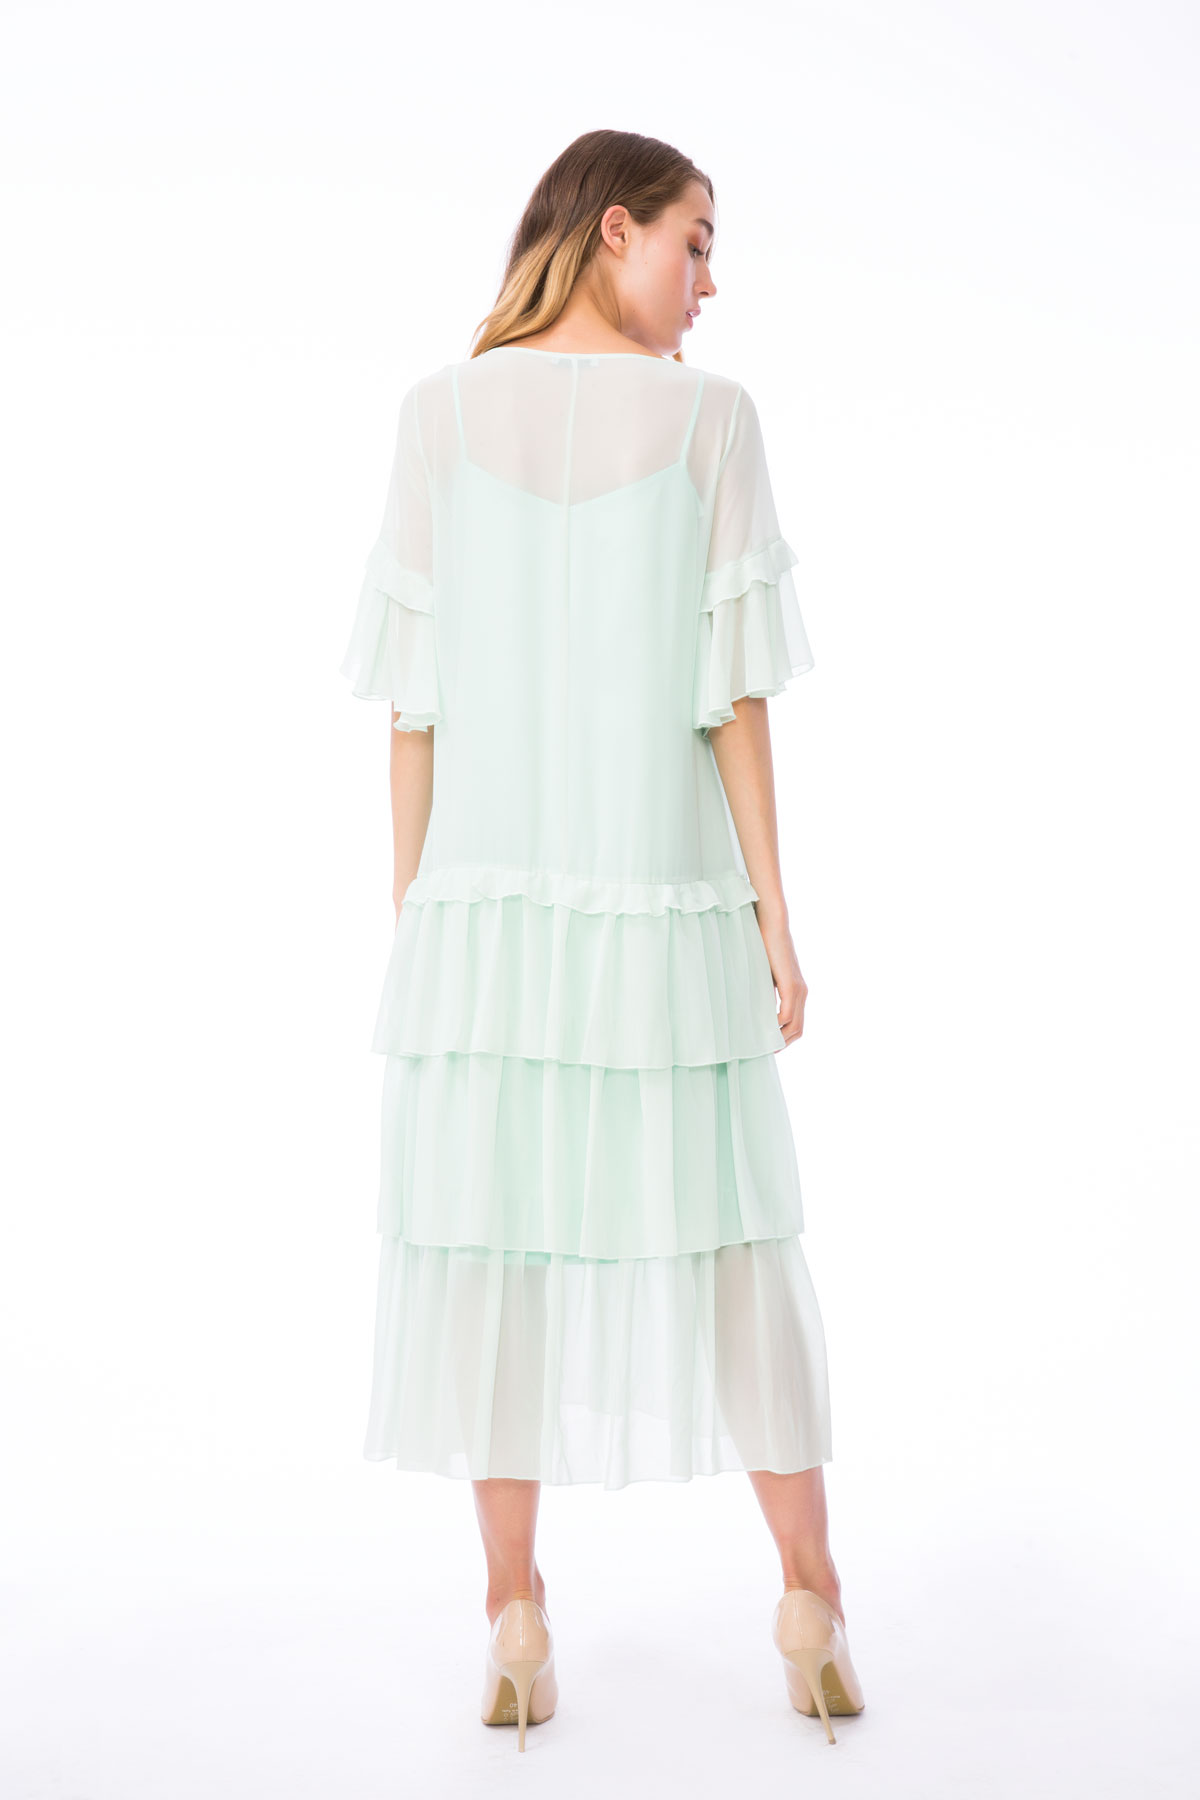 V Yaka İşleme Detaylı Fırfırlı Mint Elbise